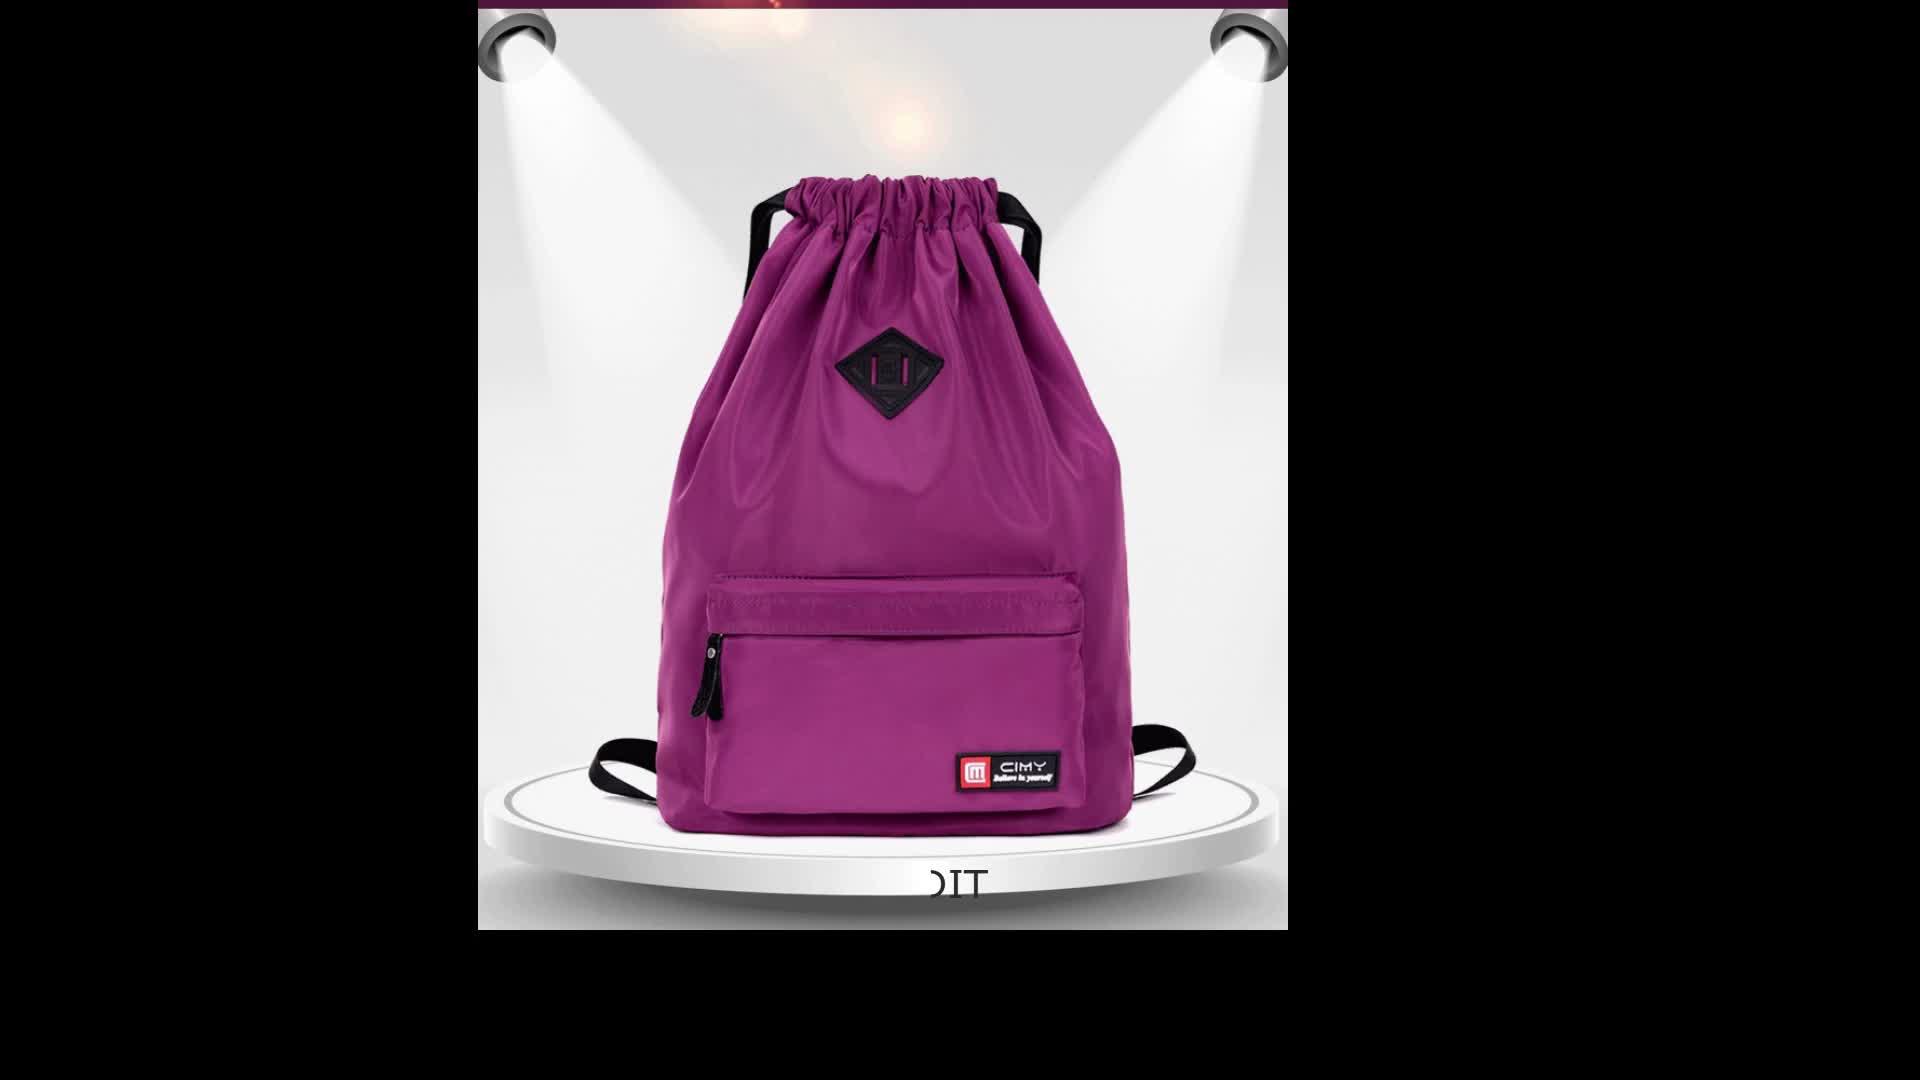 Custom Waterproof Gym Backpack Bag Nylon Drawstring Backpack Bag With Pocket